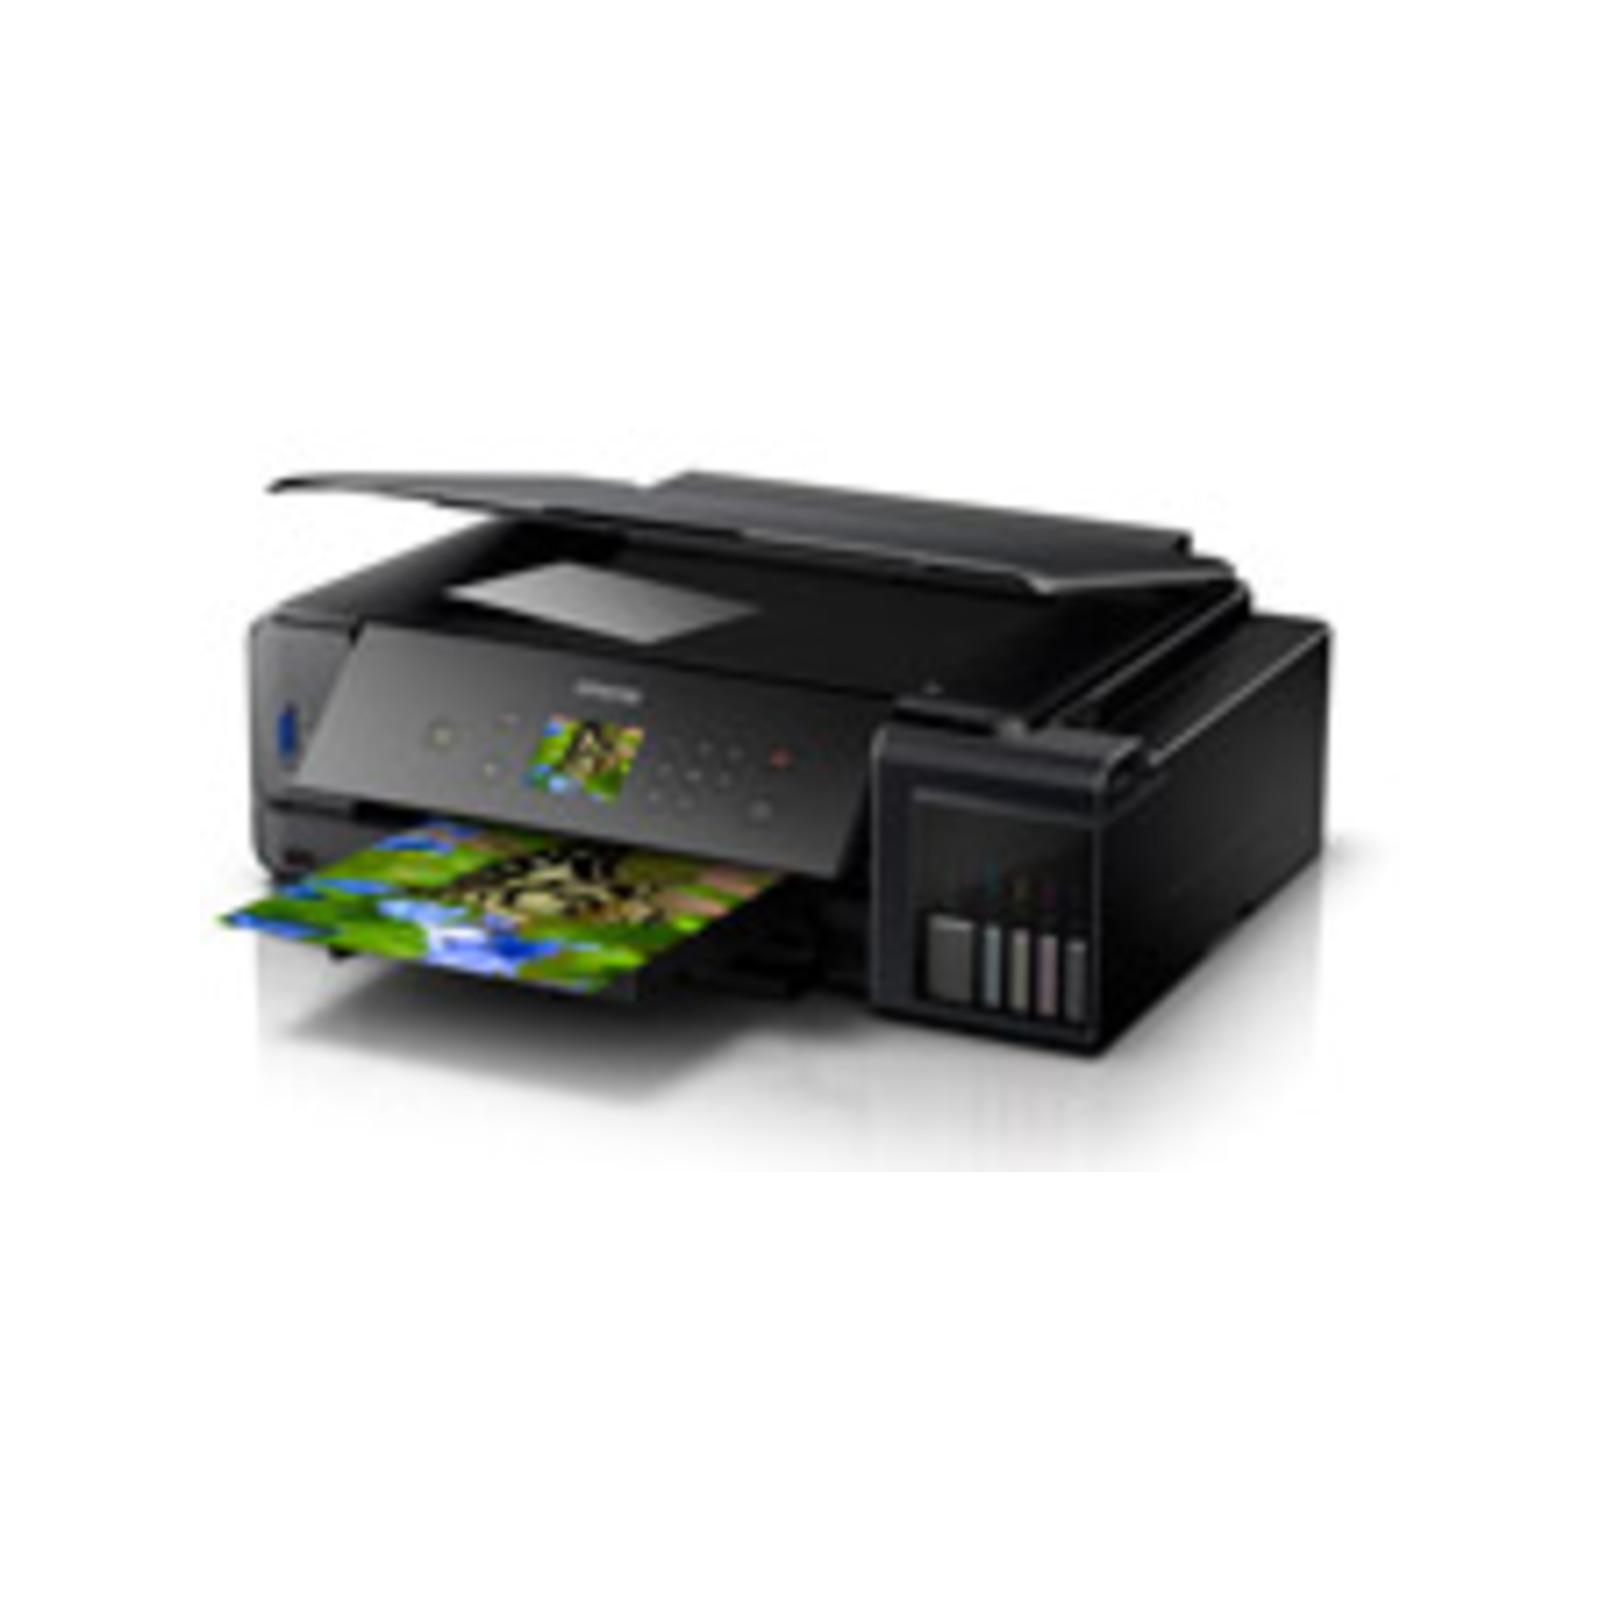 Epson EcoTank ET-7750 Inkjet Photo MFP - A3 Print (via Rear Feed), Copy, Scan, Wi-Fi Direct, Photo